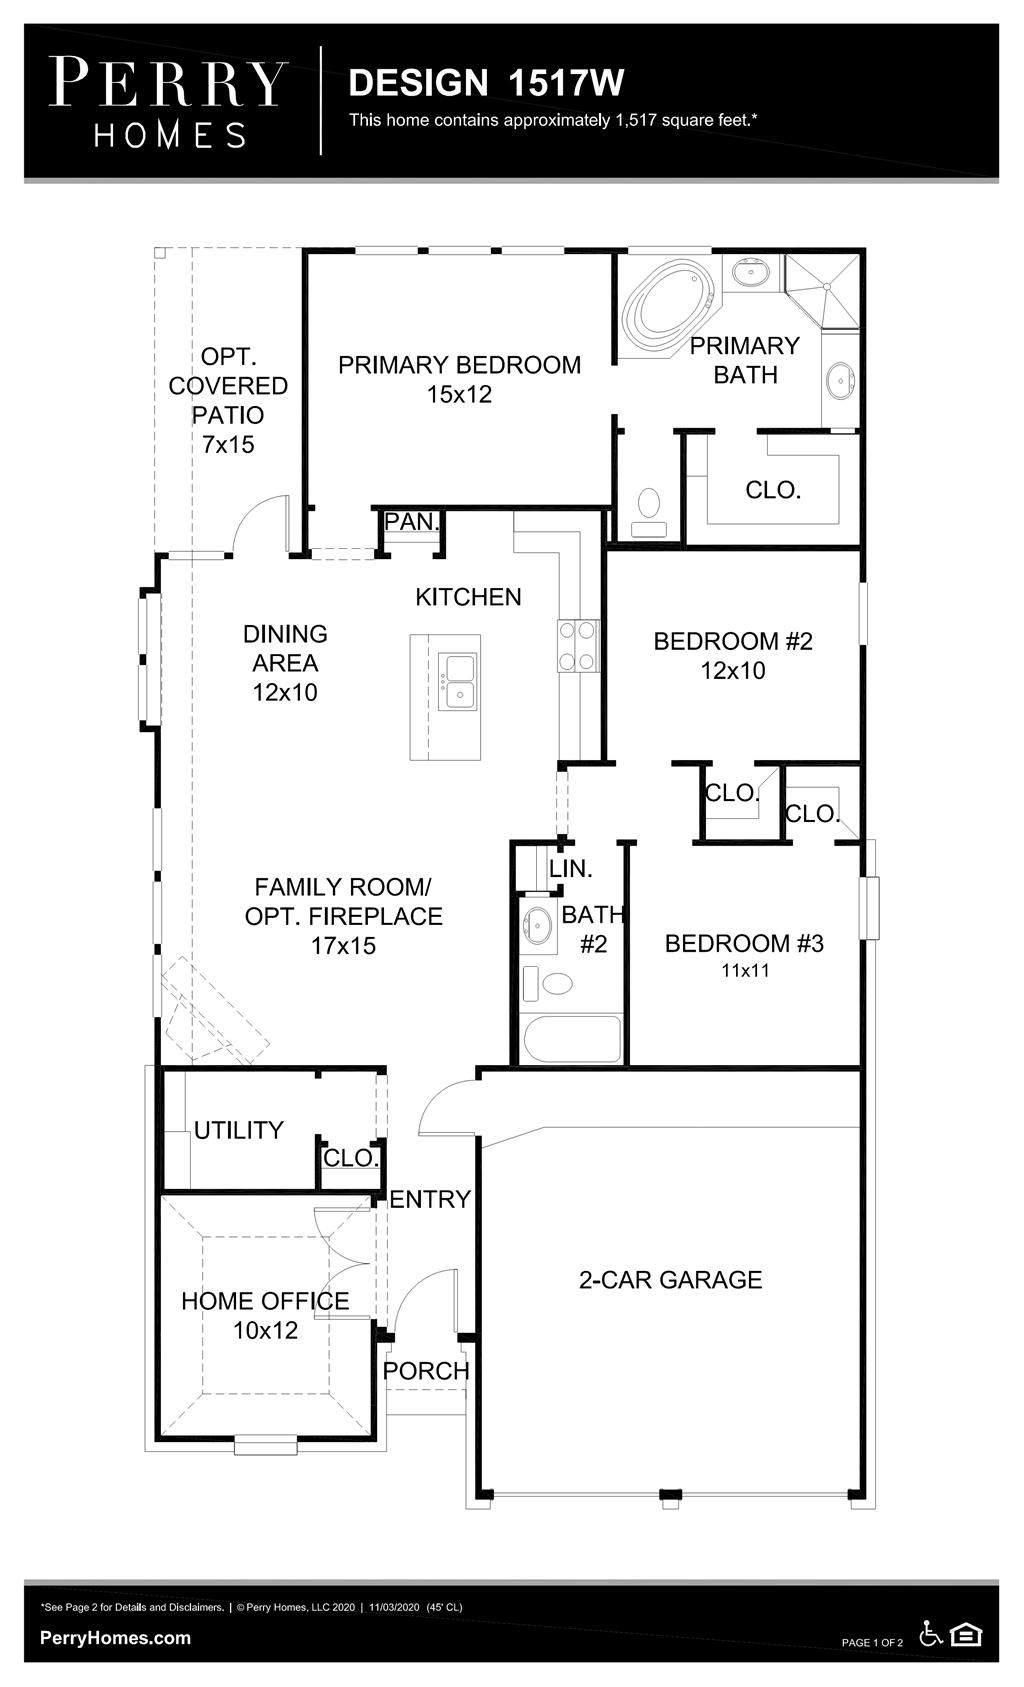 Floor Plan for 1517W